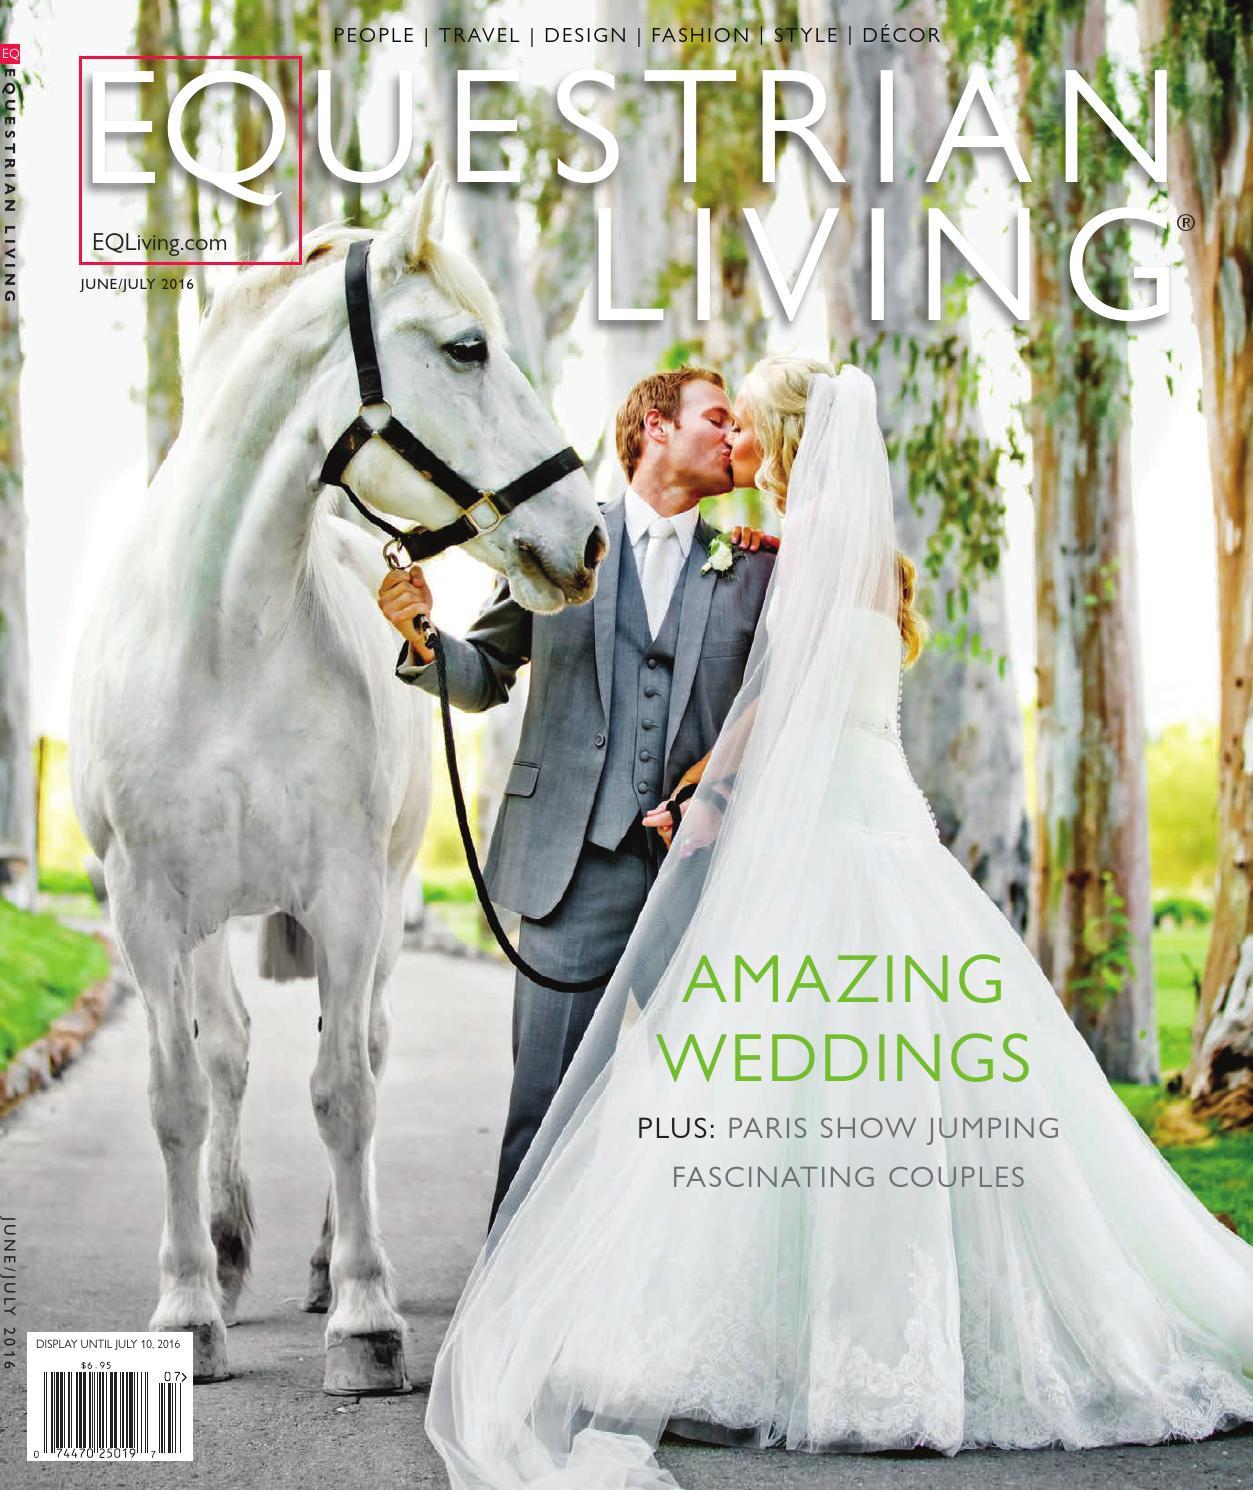 Equestrian Living - June/July 2016 | Tack room, Barn decor